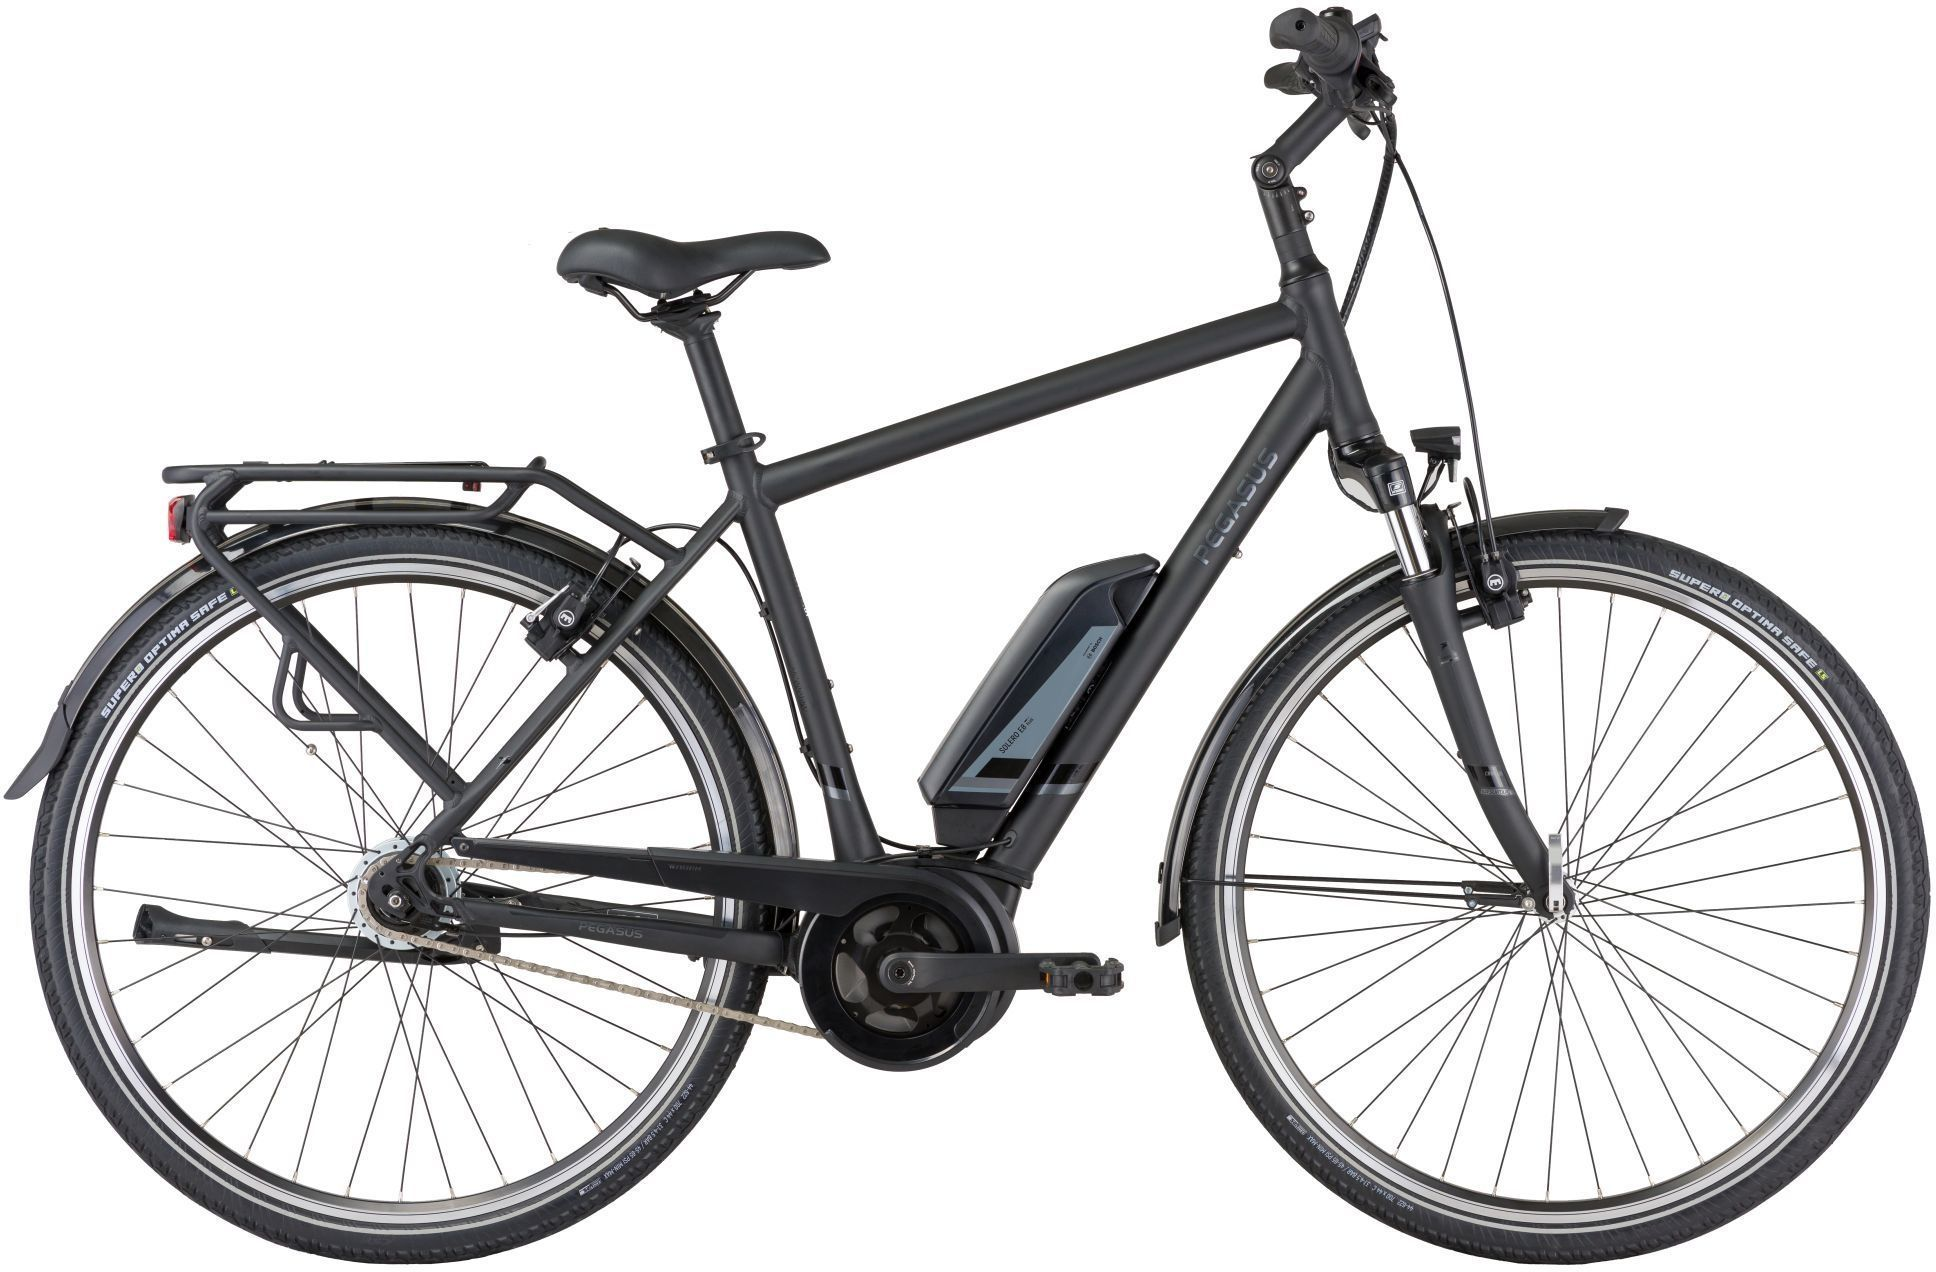 E-Bikes/Citybikes: Diamant  Solero E8R (500 Wh) 8 Gang Nabenschaltung Herrenfahrrad Diamant Modell 2021 28 Zoll 48 cm